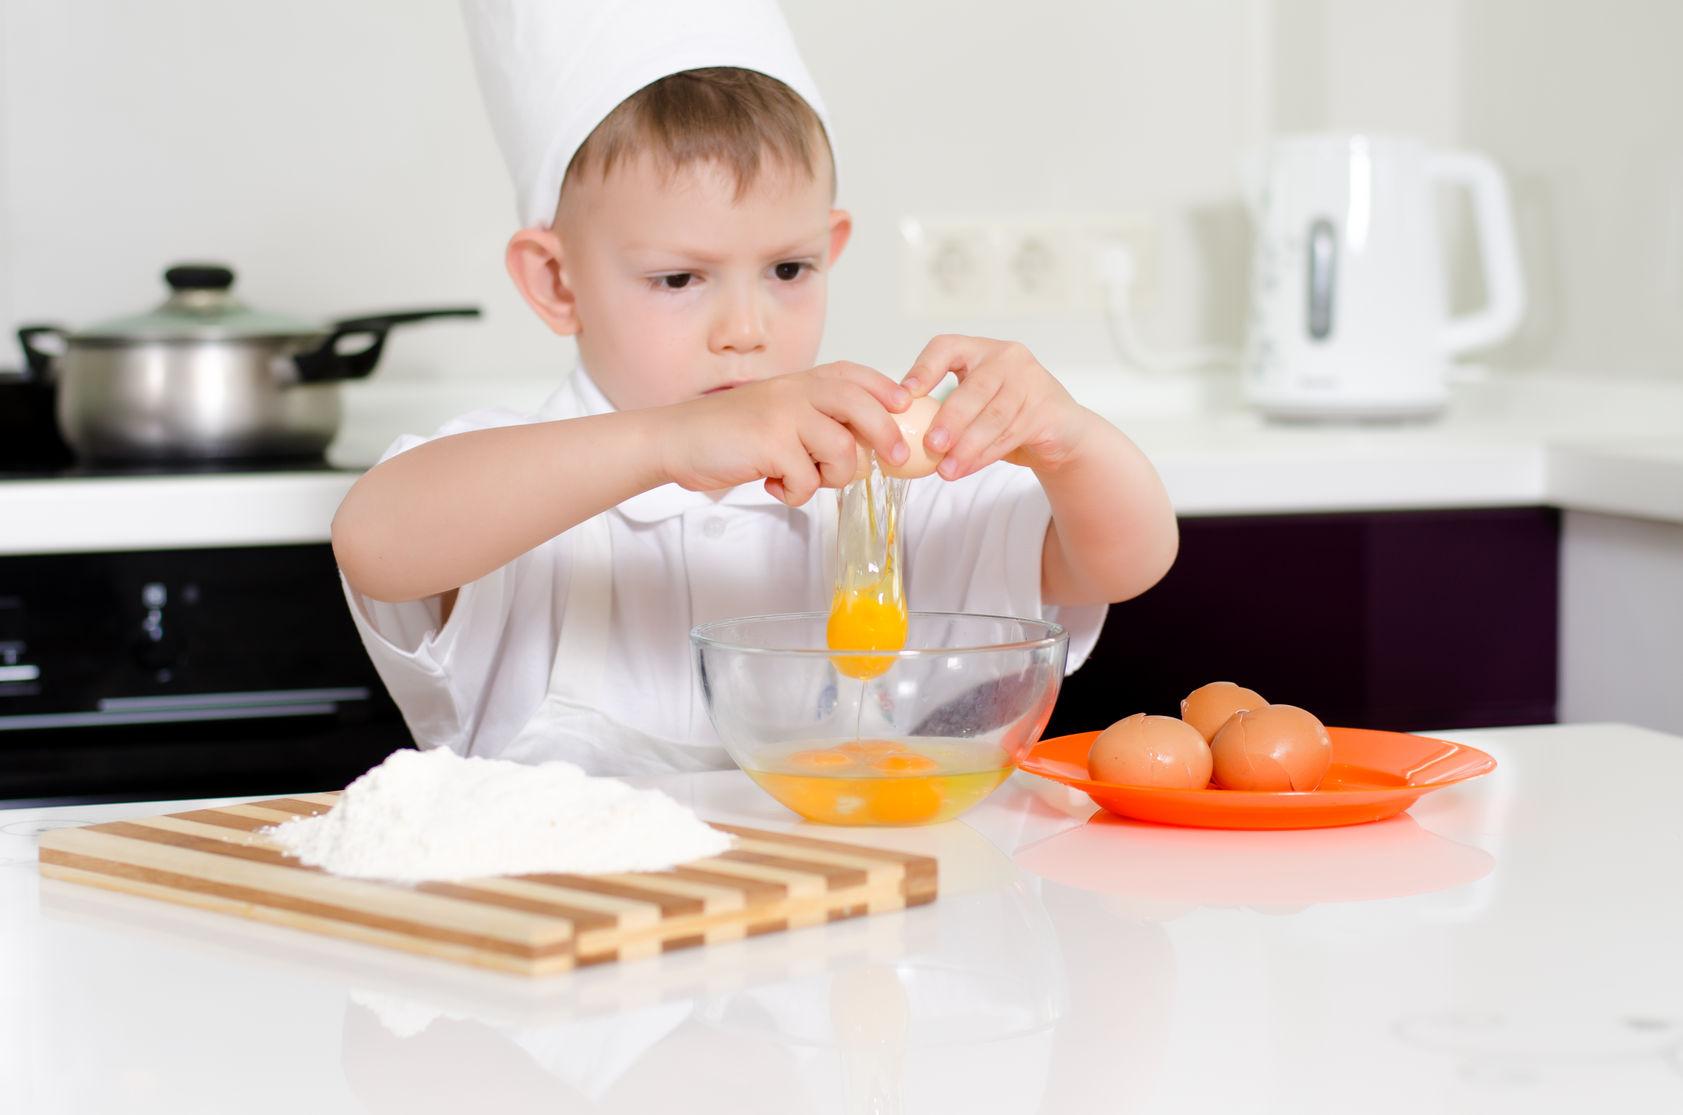 Junior Cookies Summer Term with Membership - afternoon